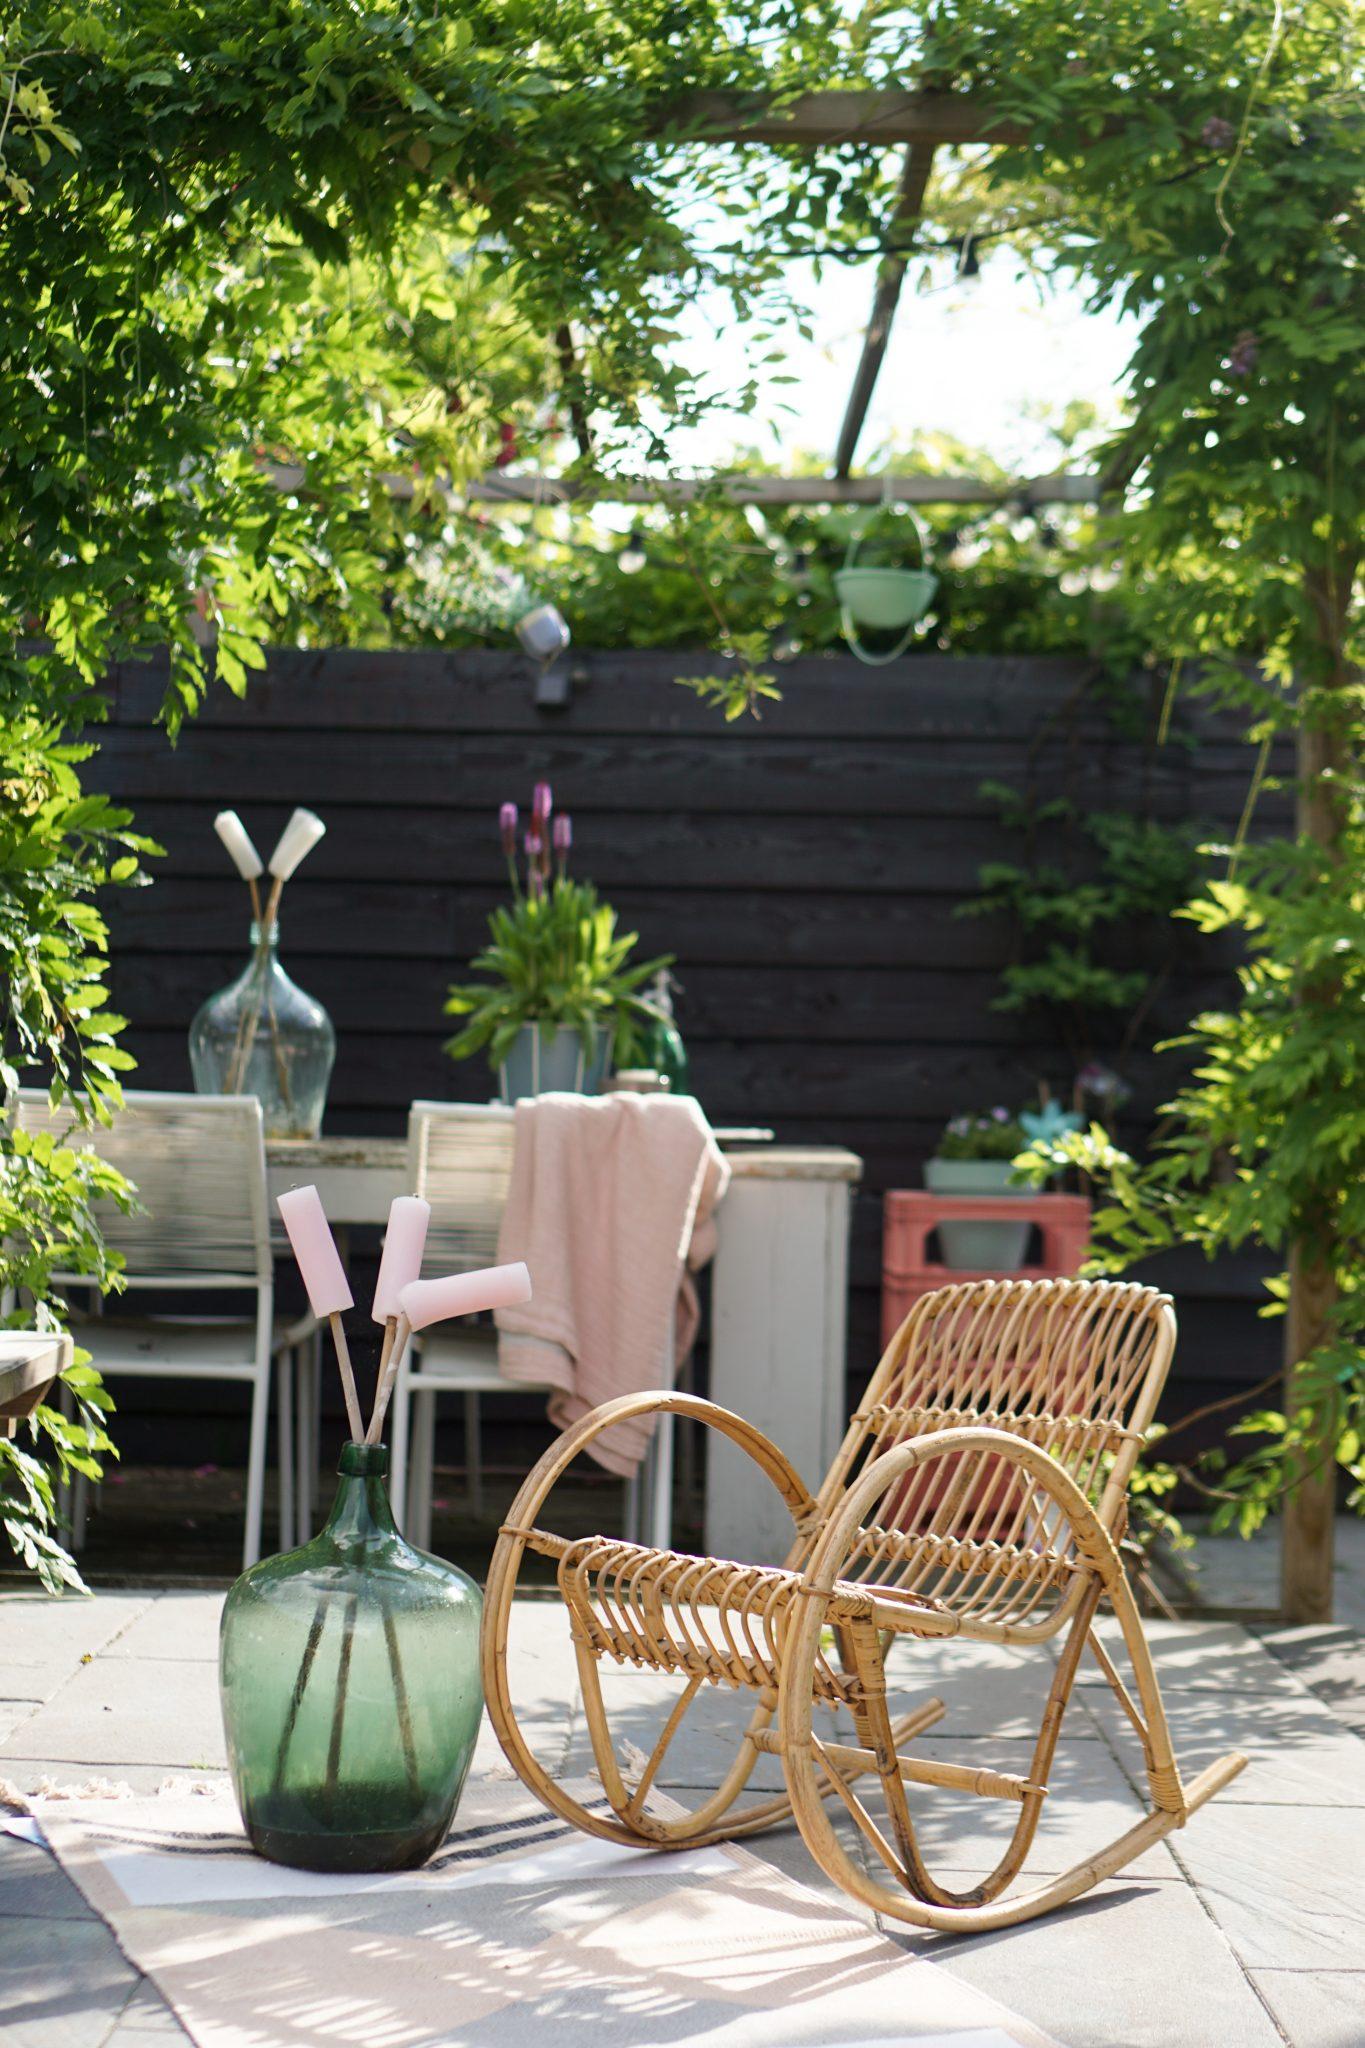 Binnenkijken in onze zomerse tuin